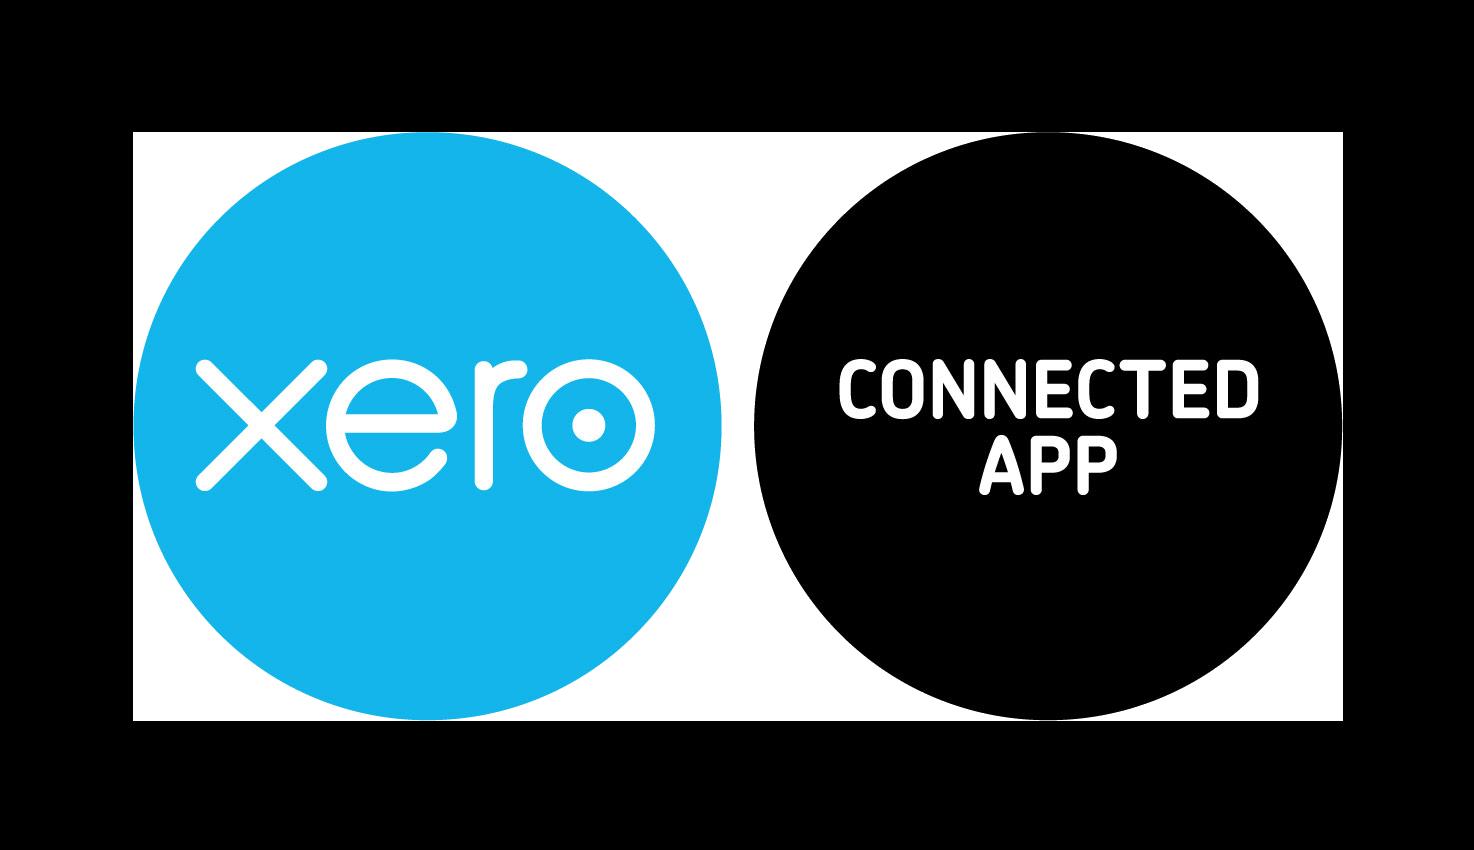 Xero Partner Connected App Logo